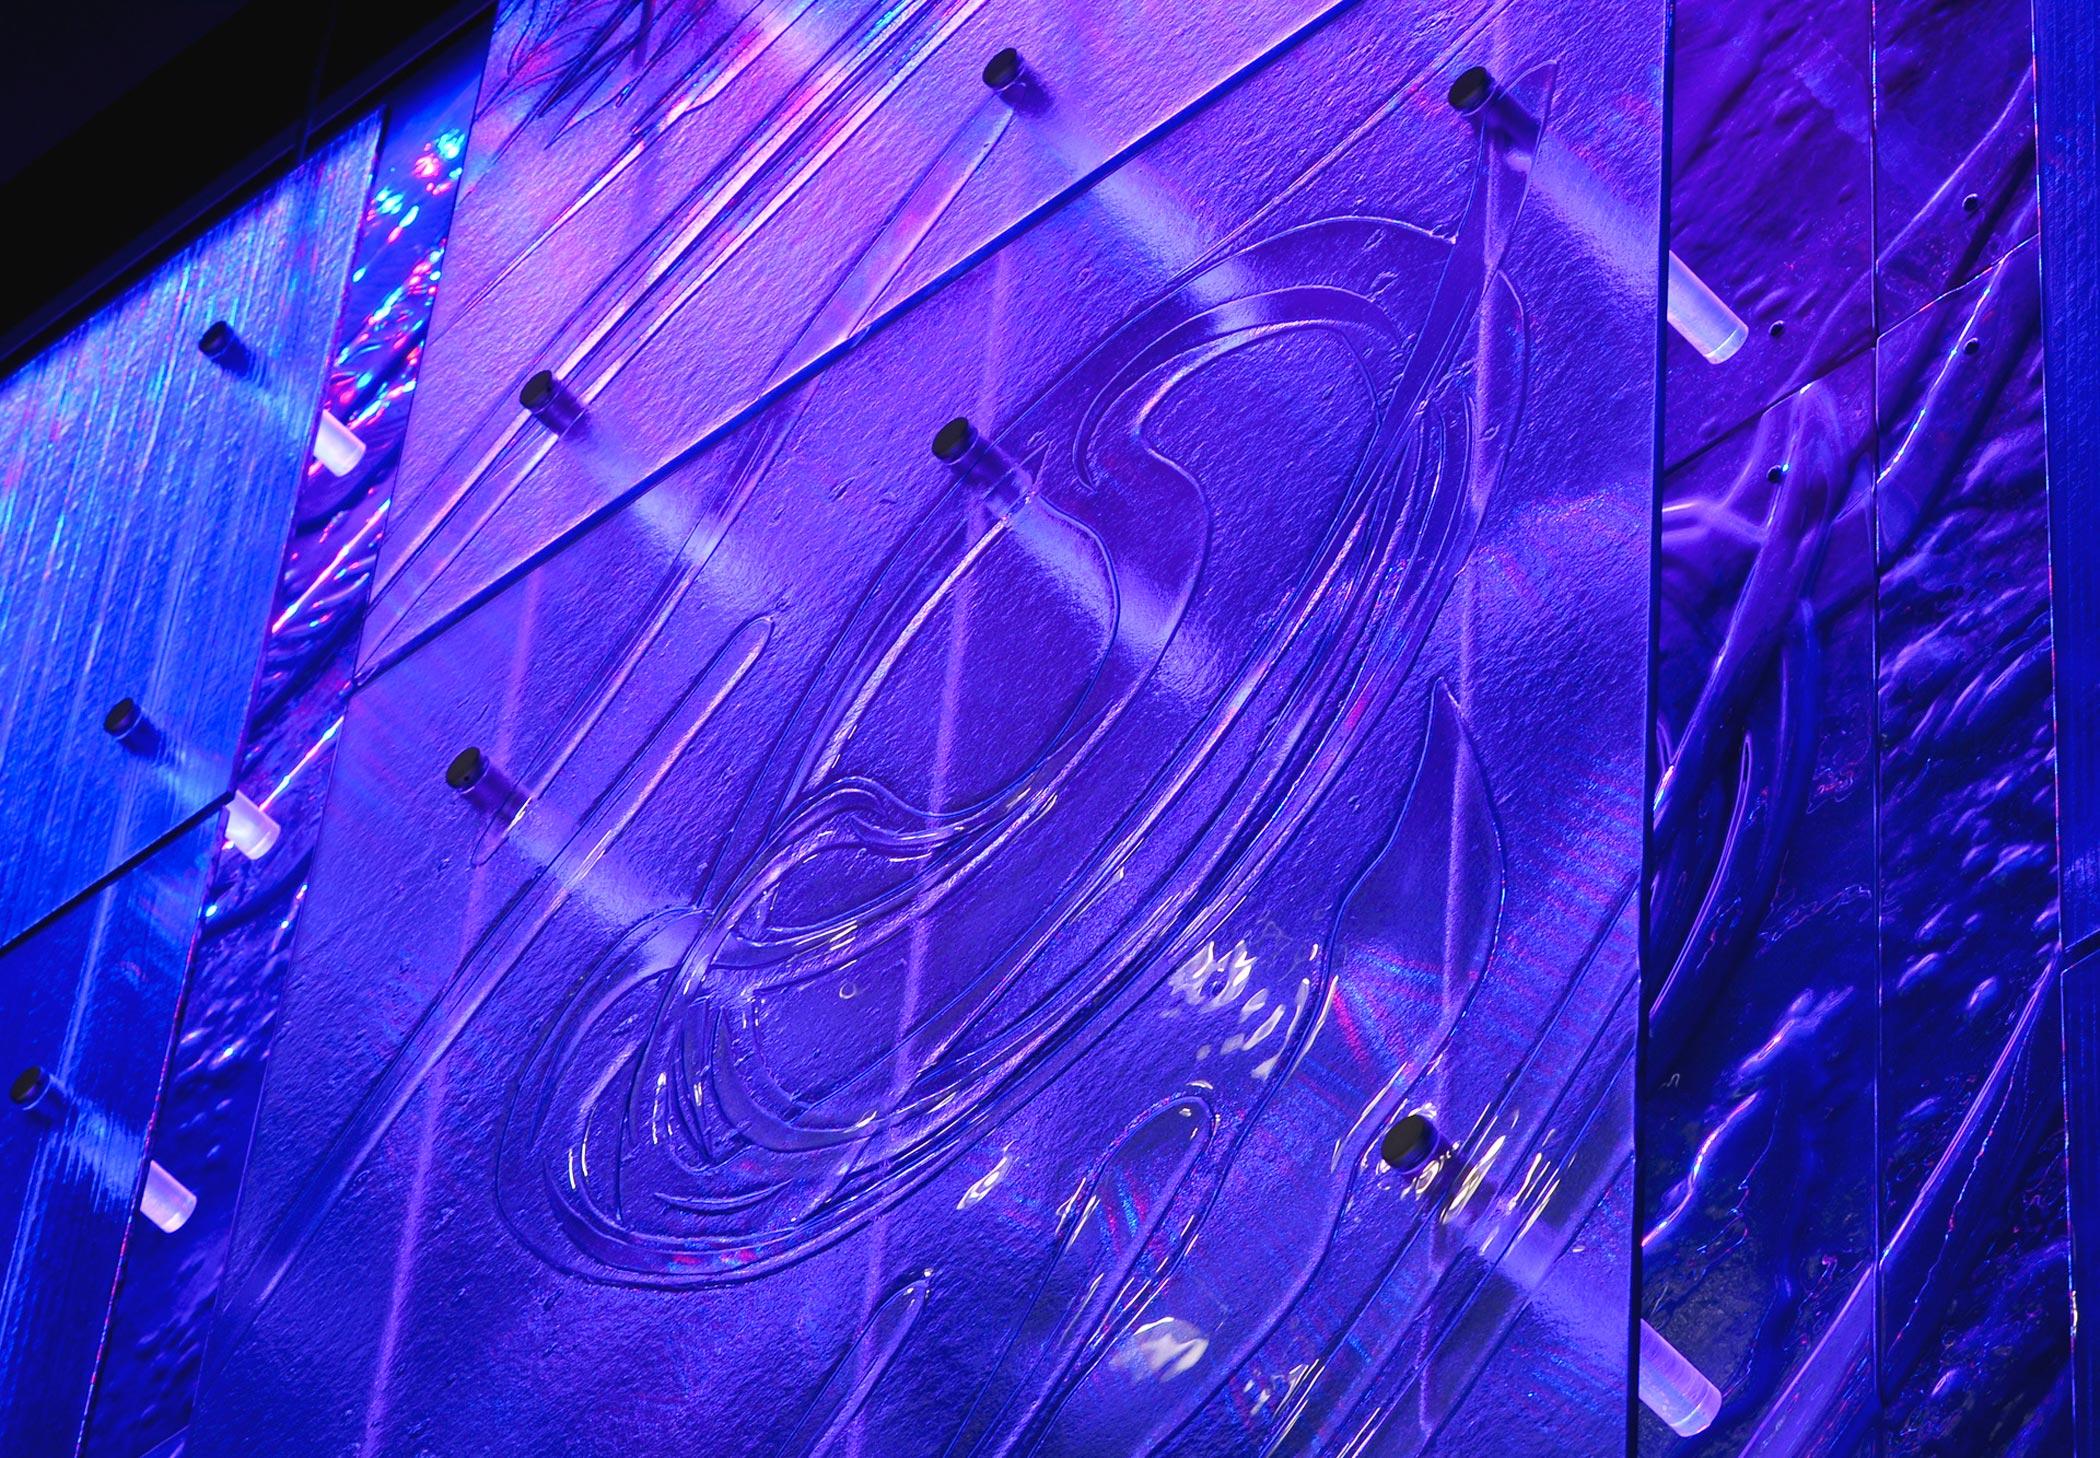 David Griggs Public Art Glass Installation Potenza